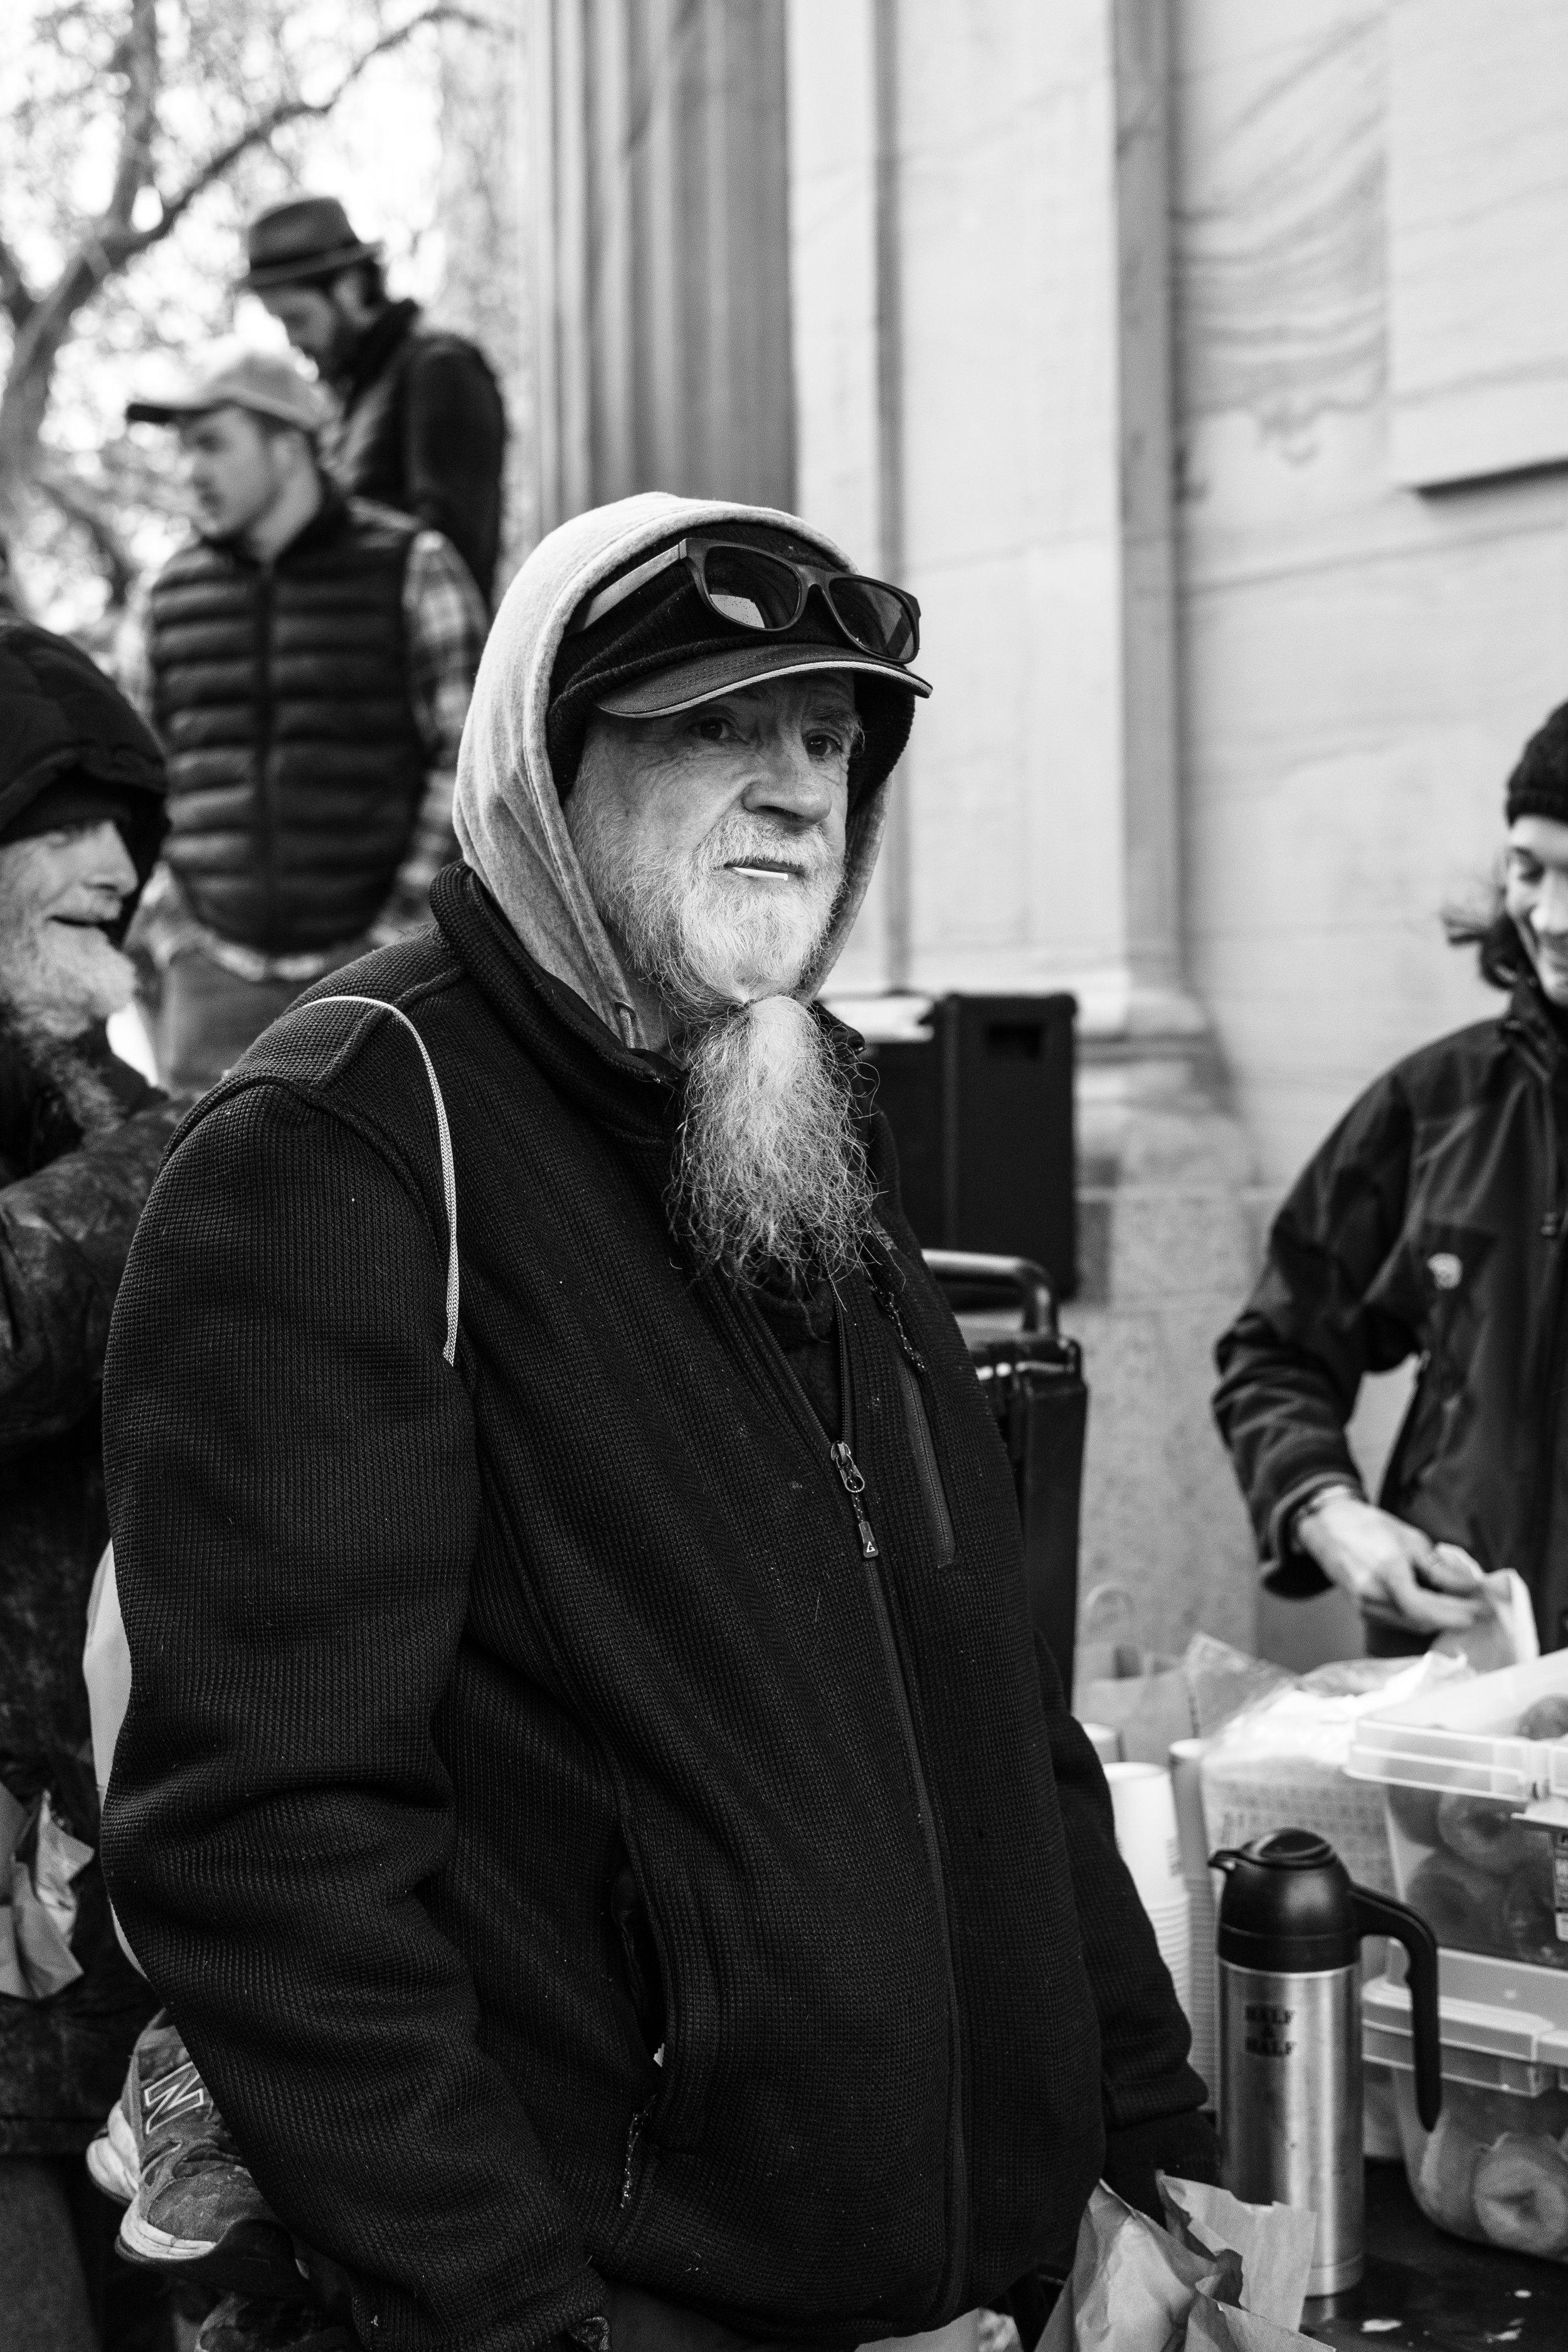 deaf homeless man